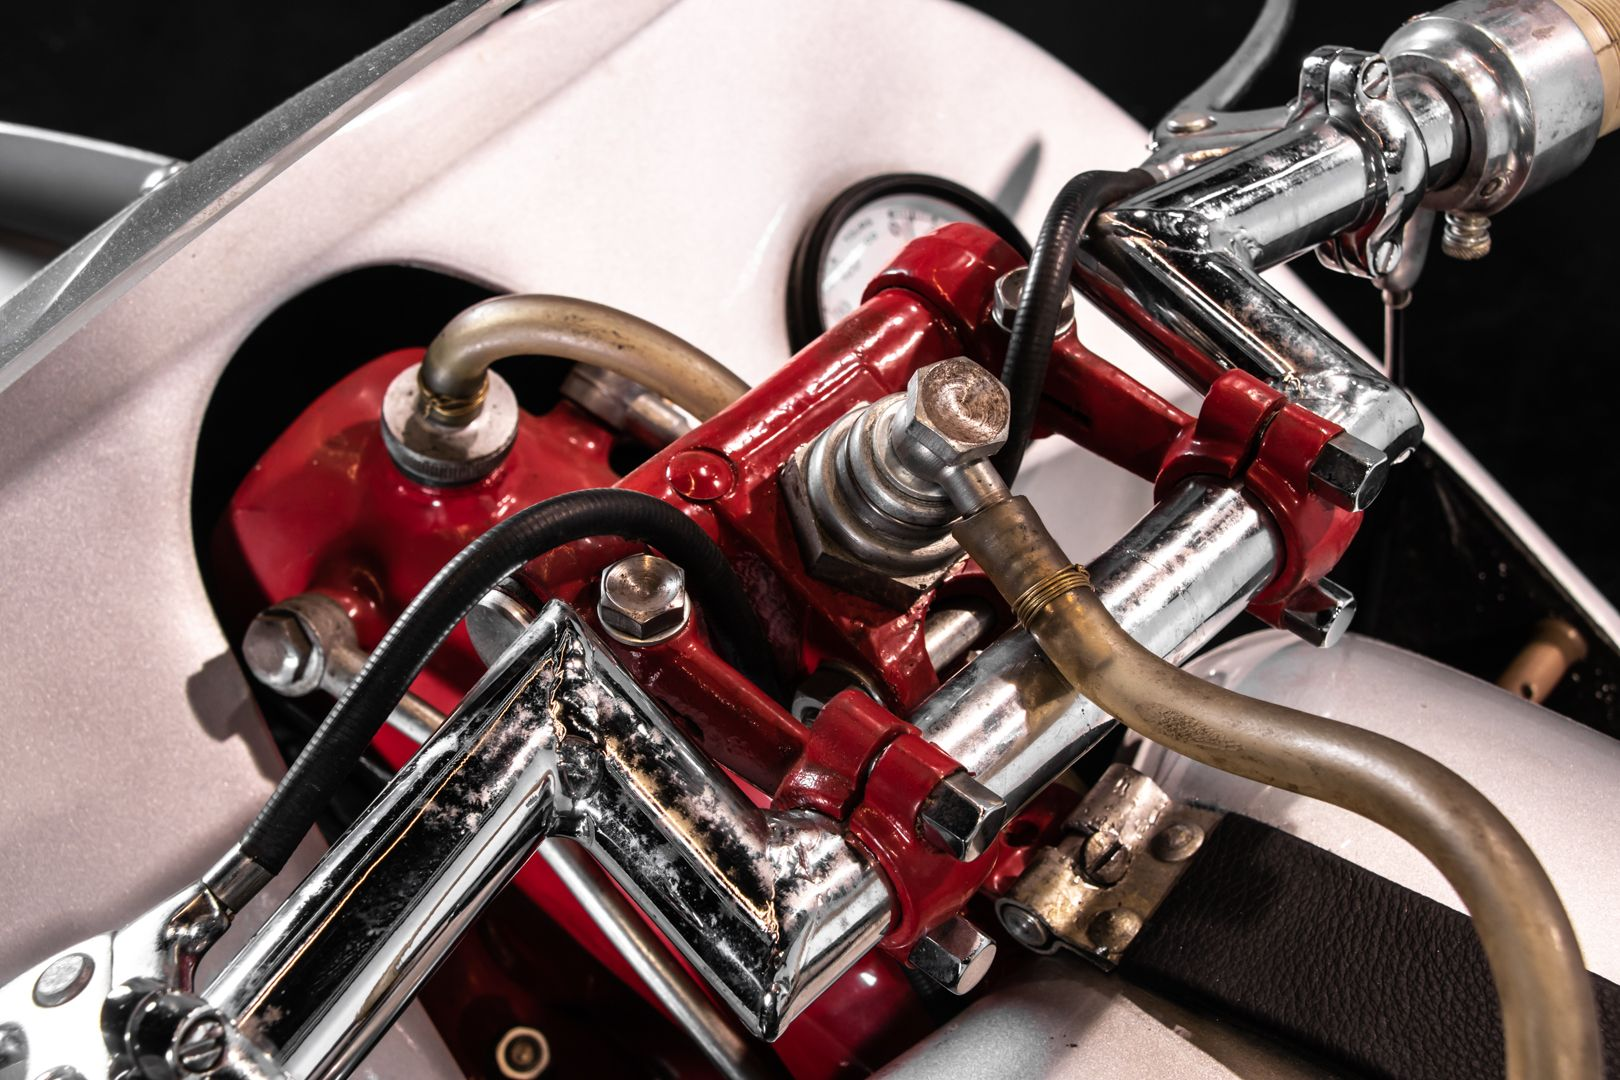 1930 Moto Guzzi 250 SS Corsa 77204